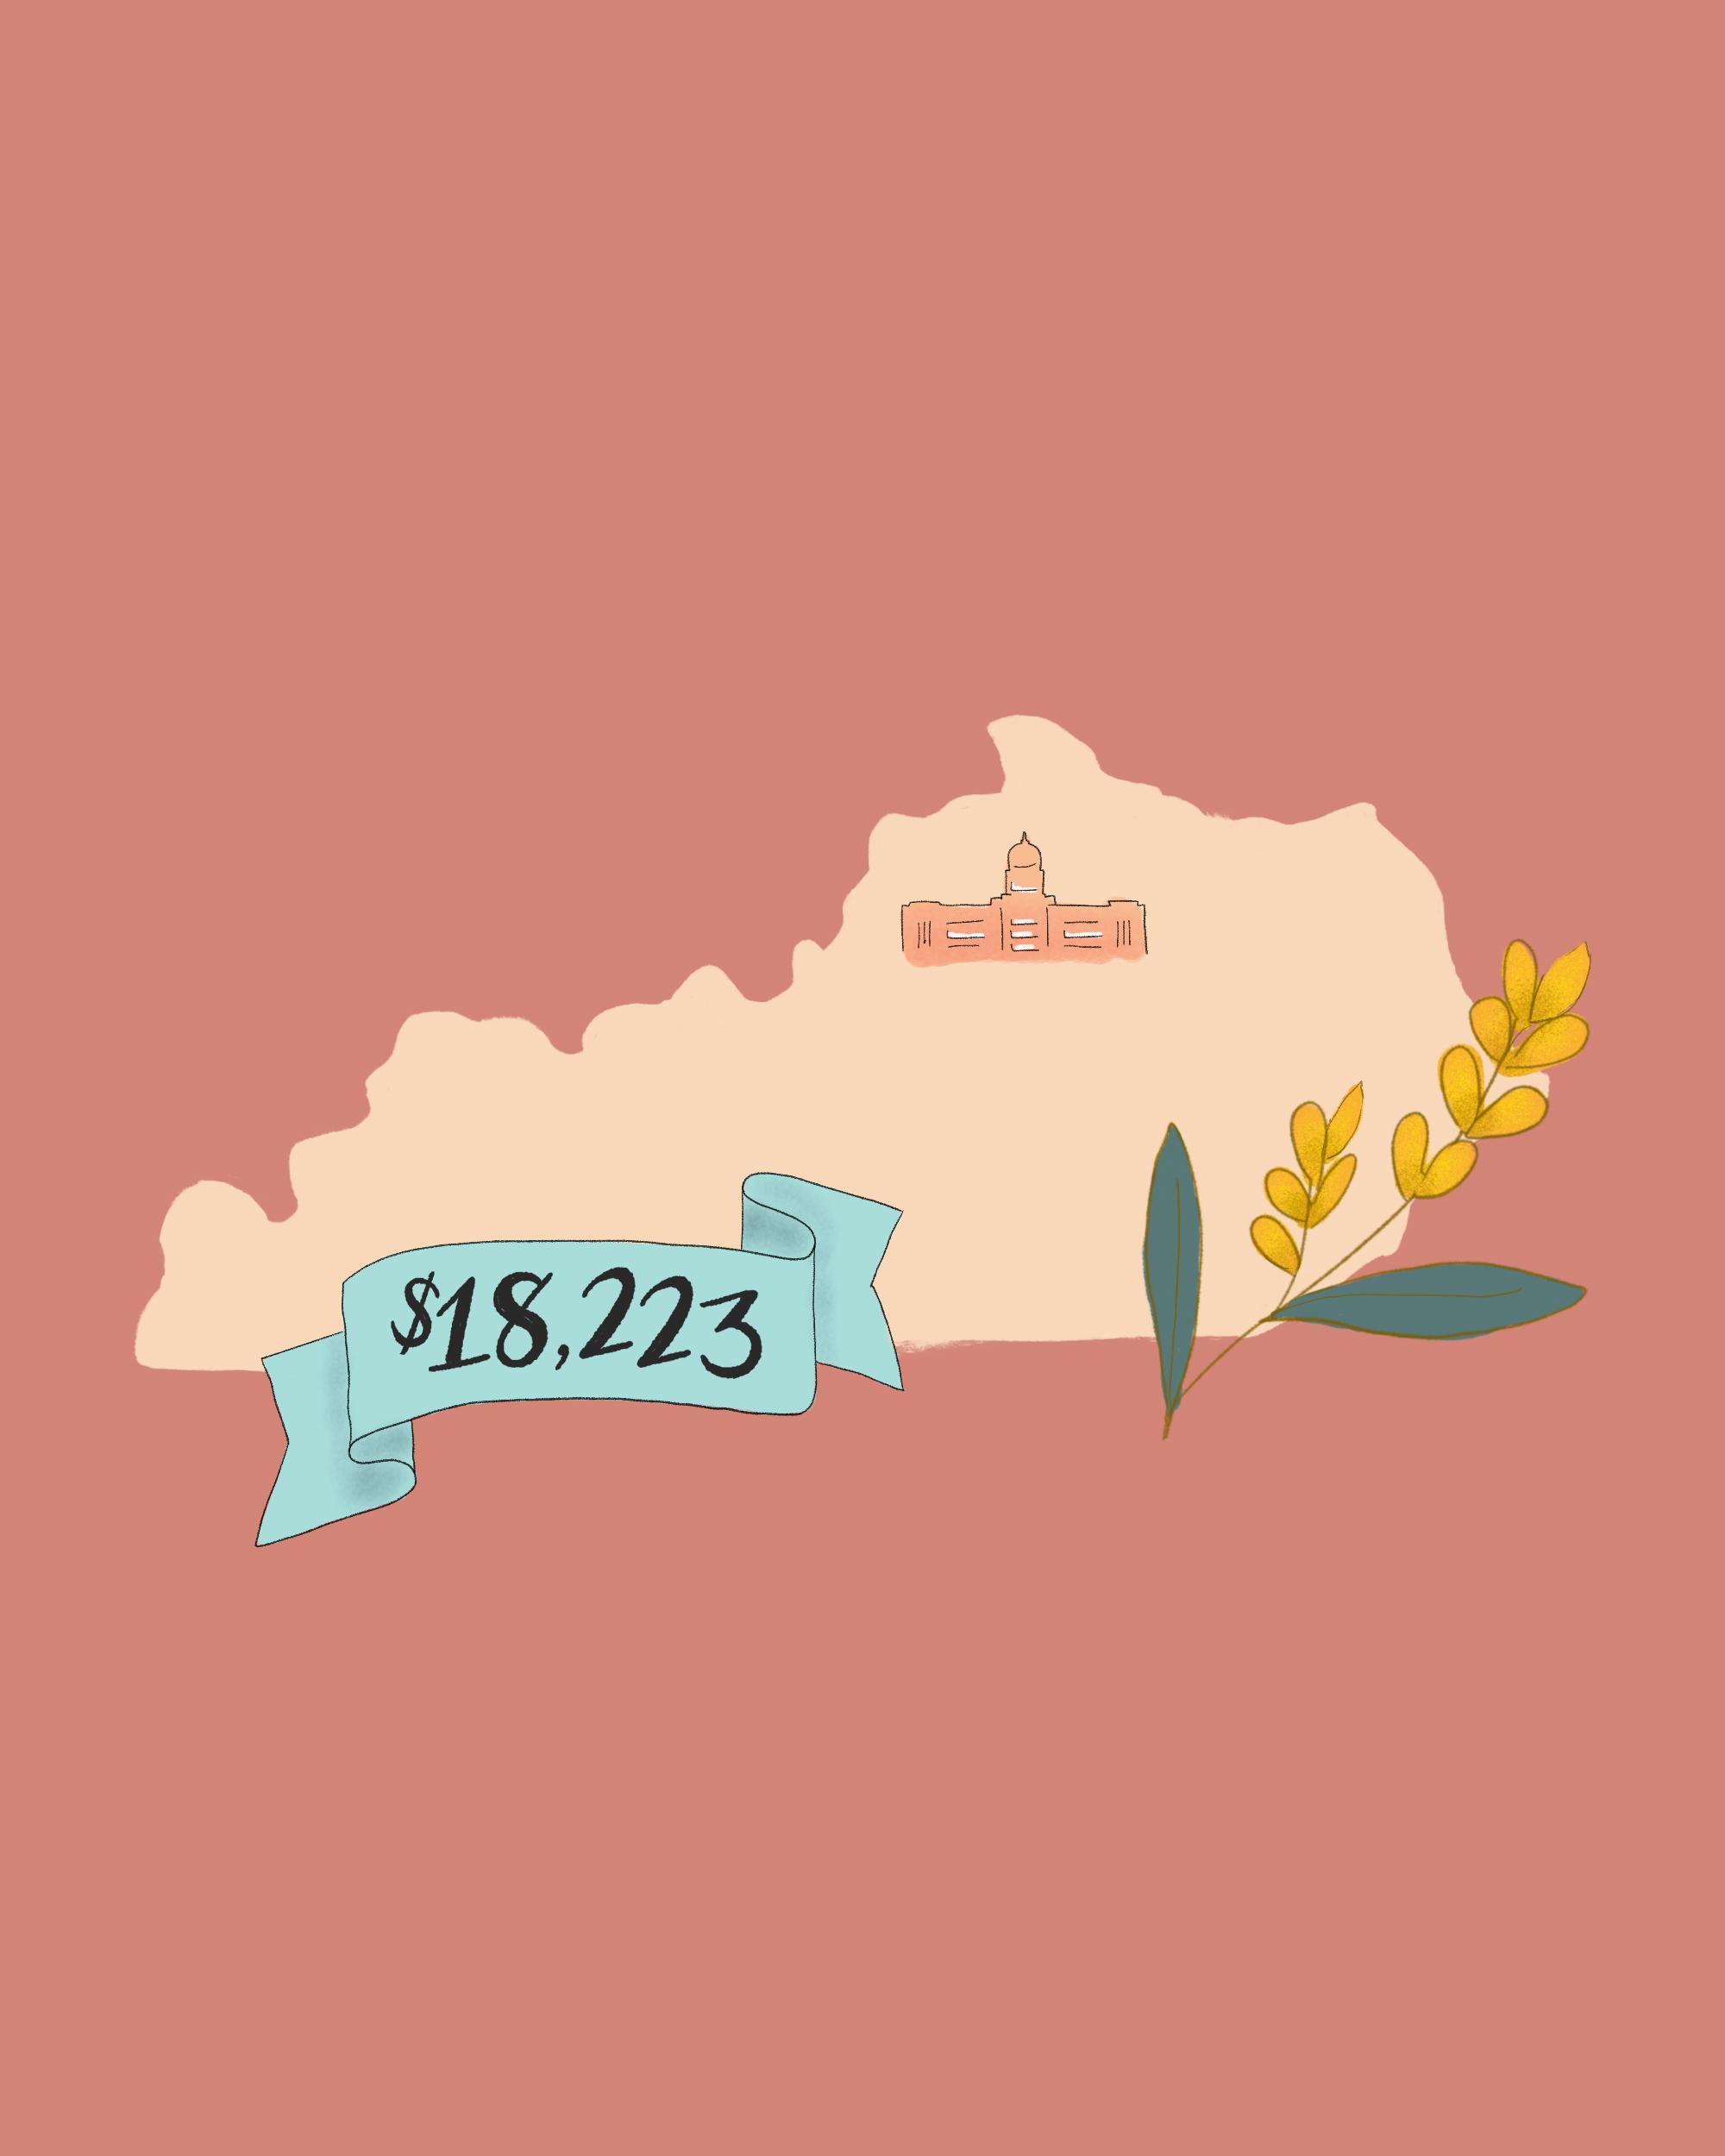 state wedding costs illustration kentucky